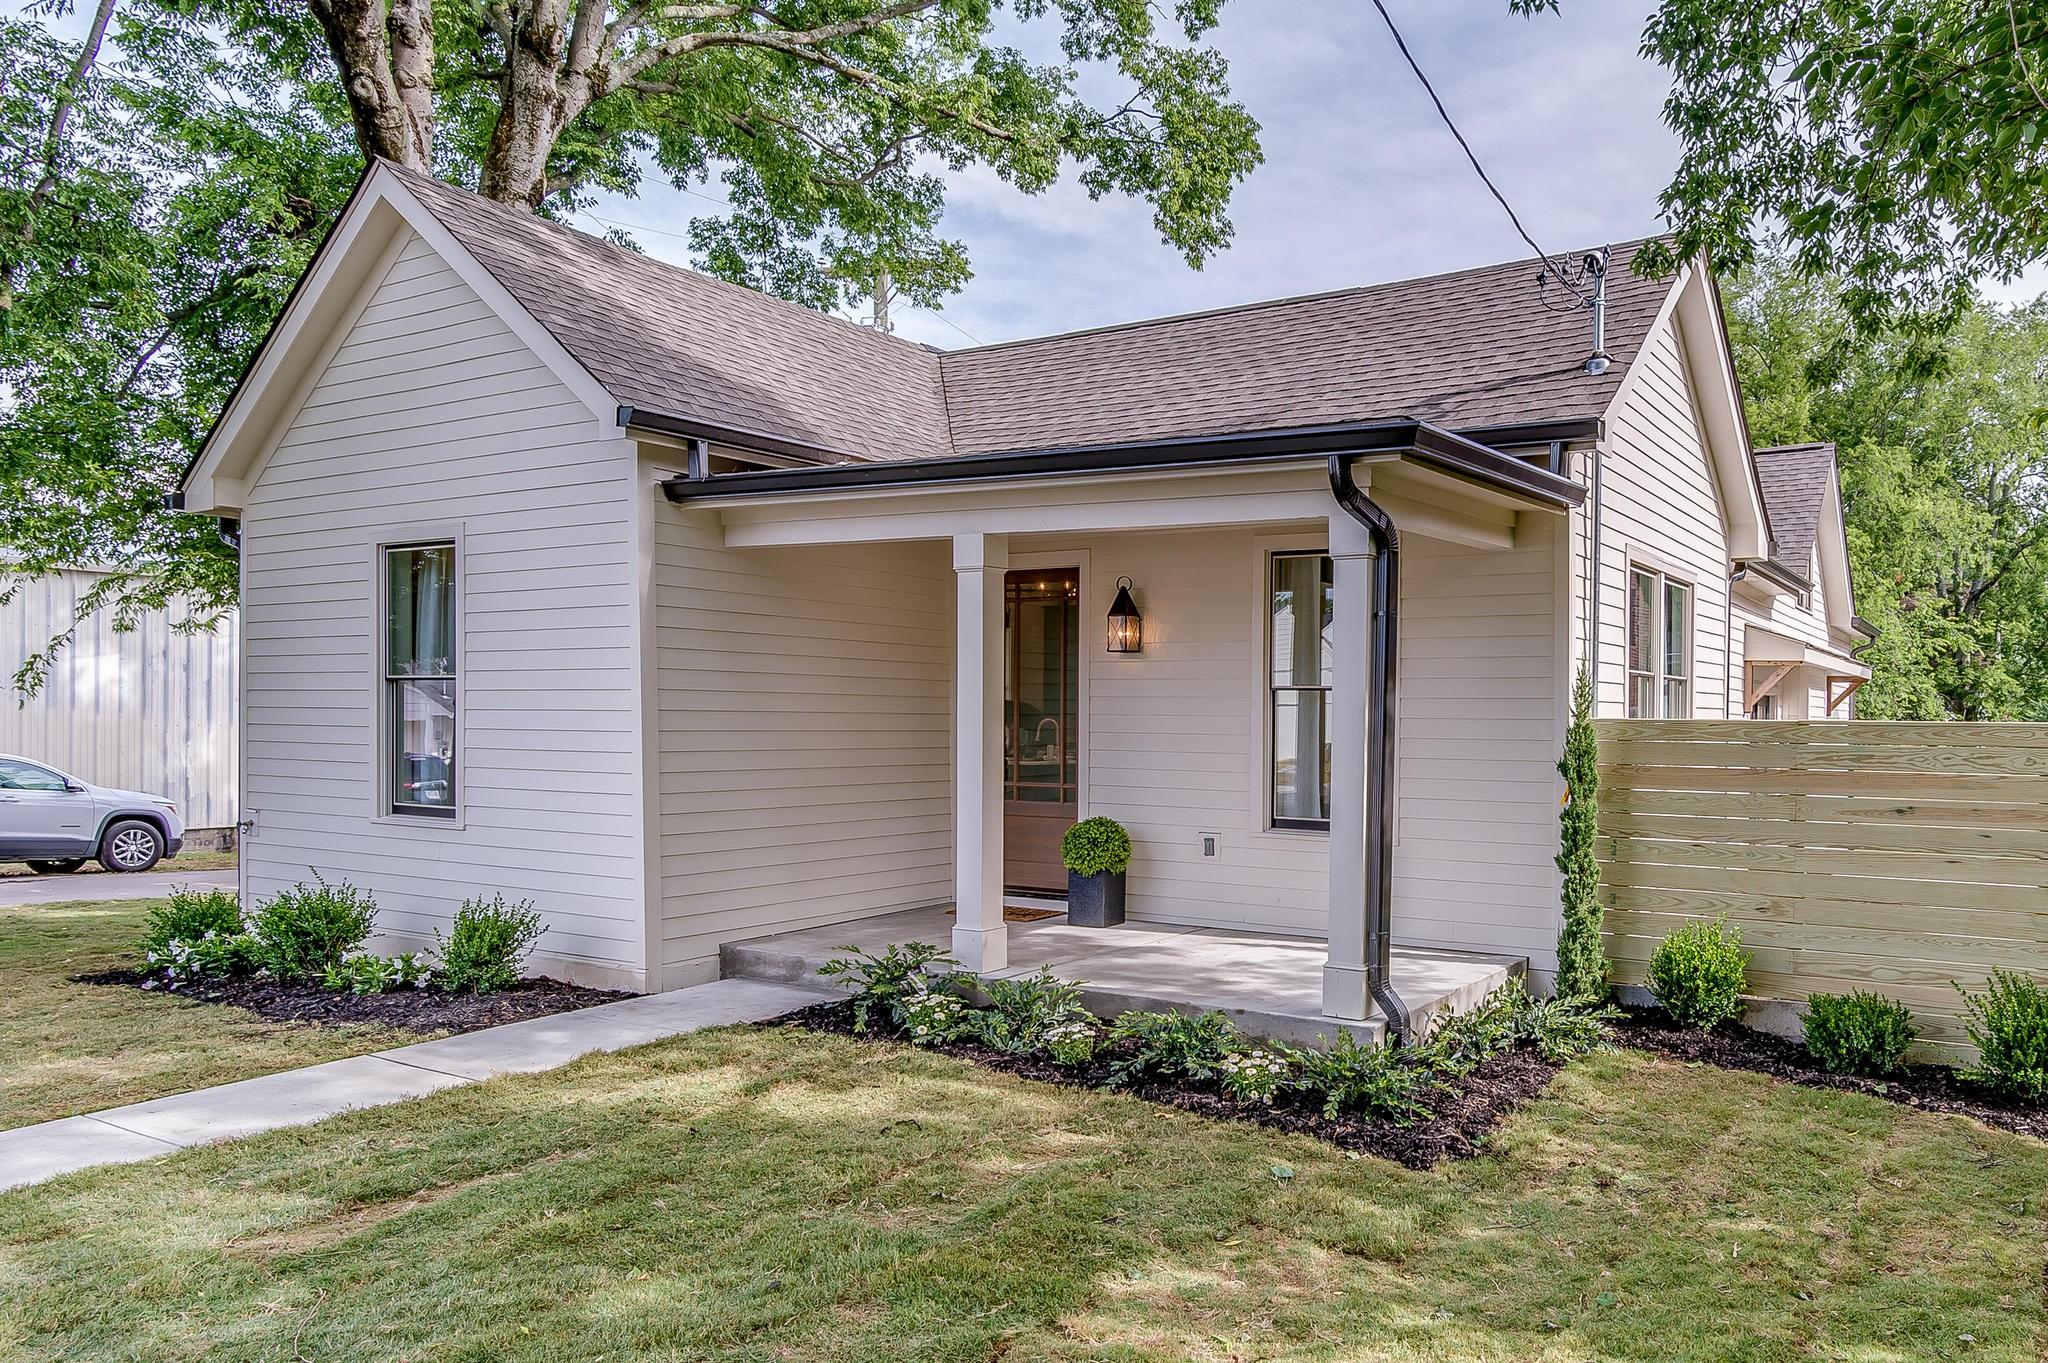 1207 Dallas Ave Property Photo - Nashville, TN real estate listing